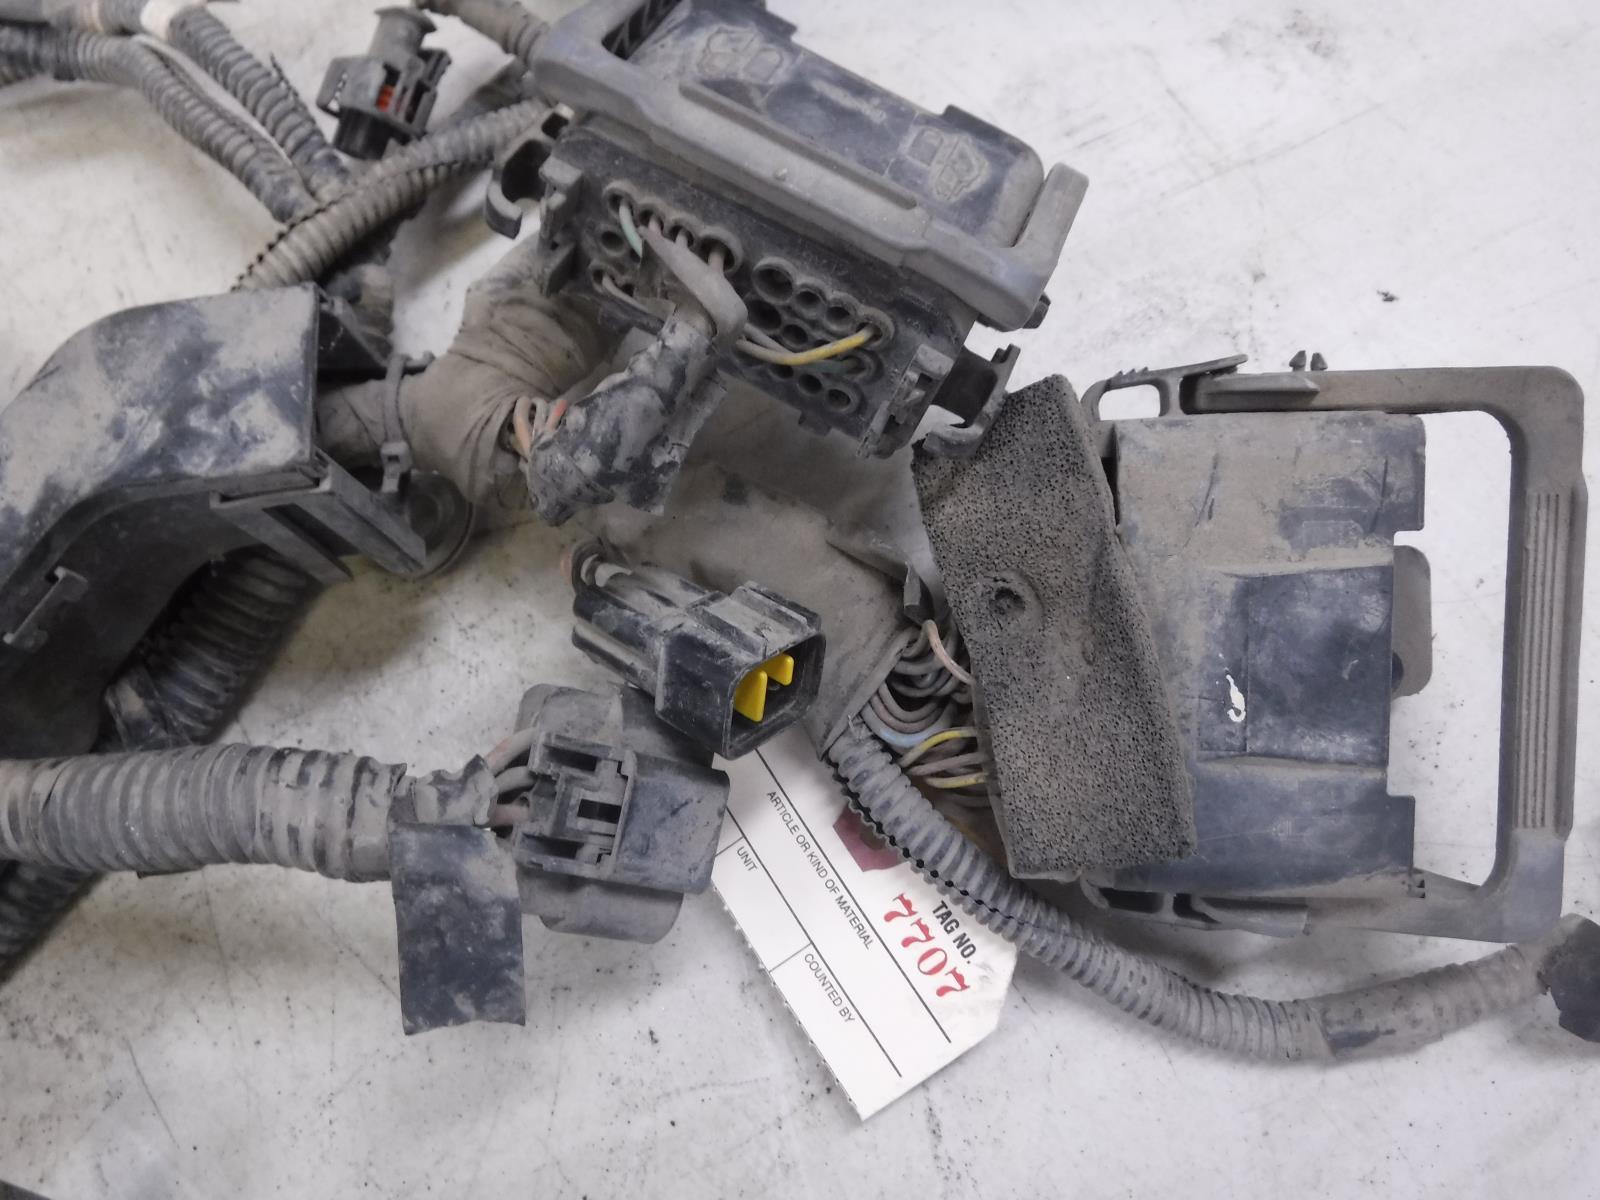 2001 2002 2003 Chevrolet 6 6 Duramax Lb7 Engine Wiring Harness Lb7 Wiring  Harness Lb7 Wiring Harness